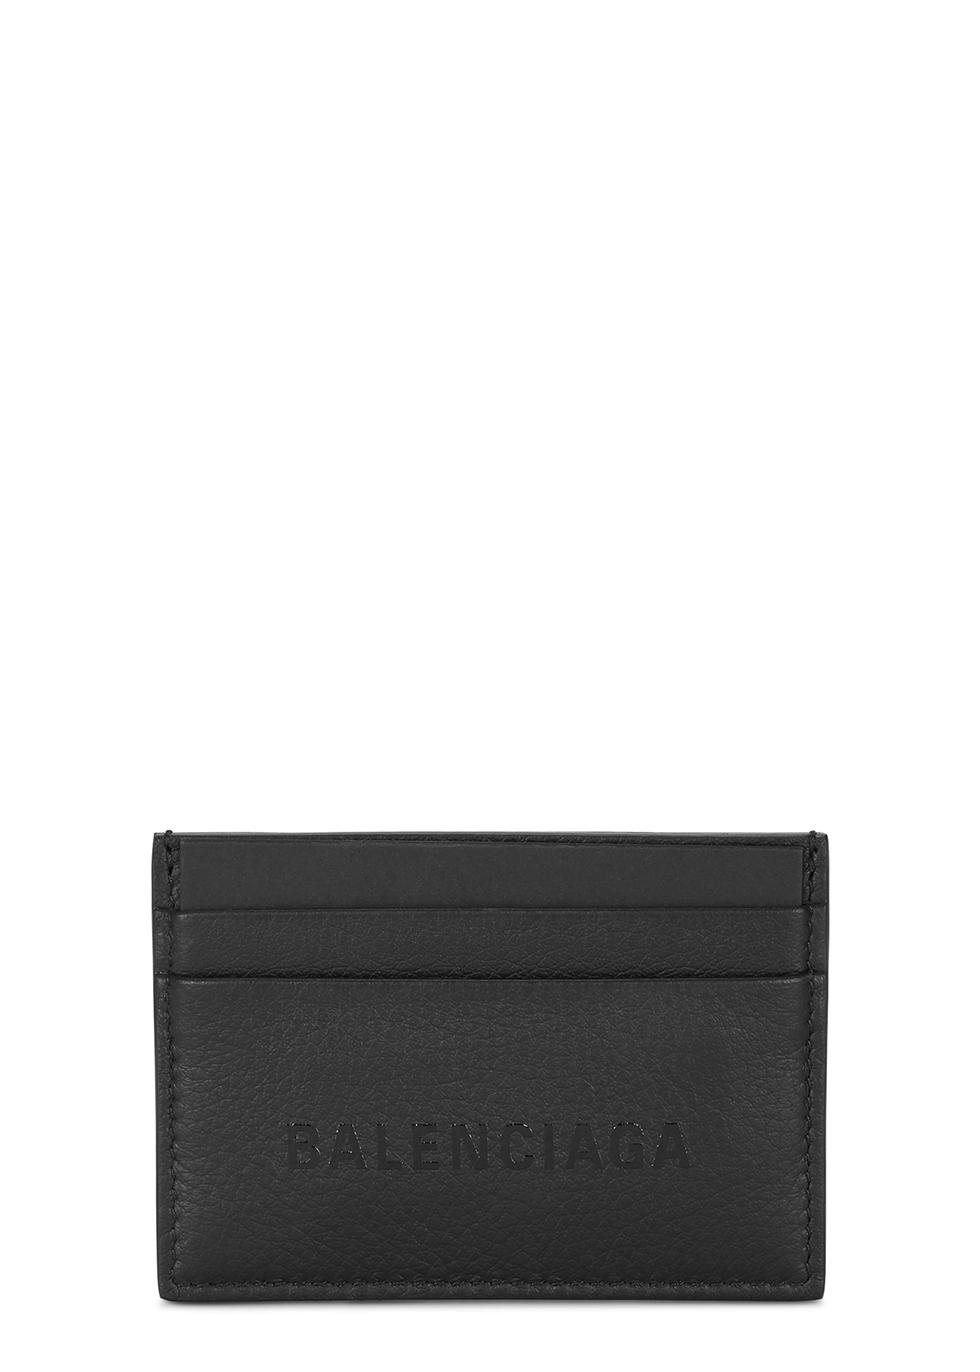 Black logo leather card holder - Balenciaga